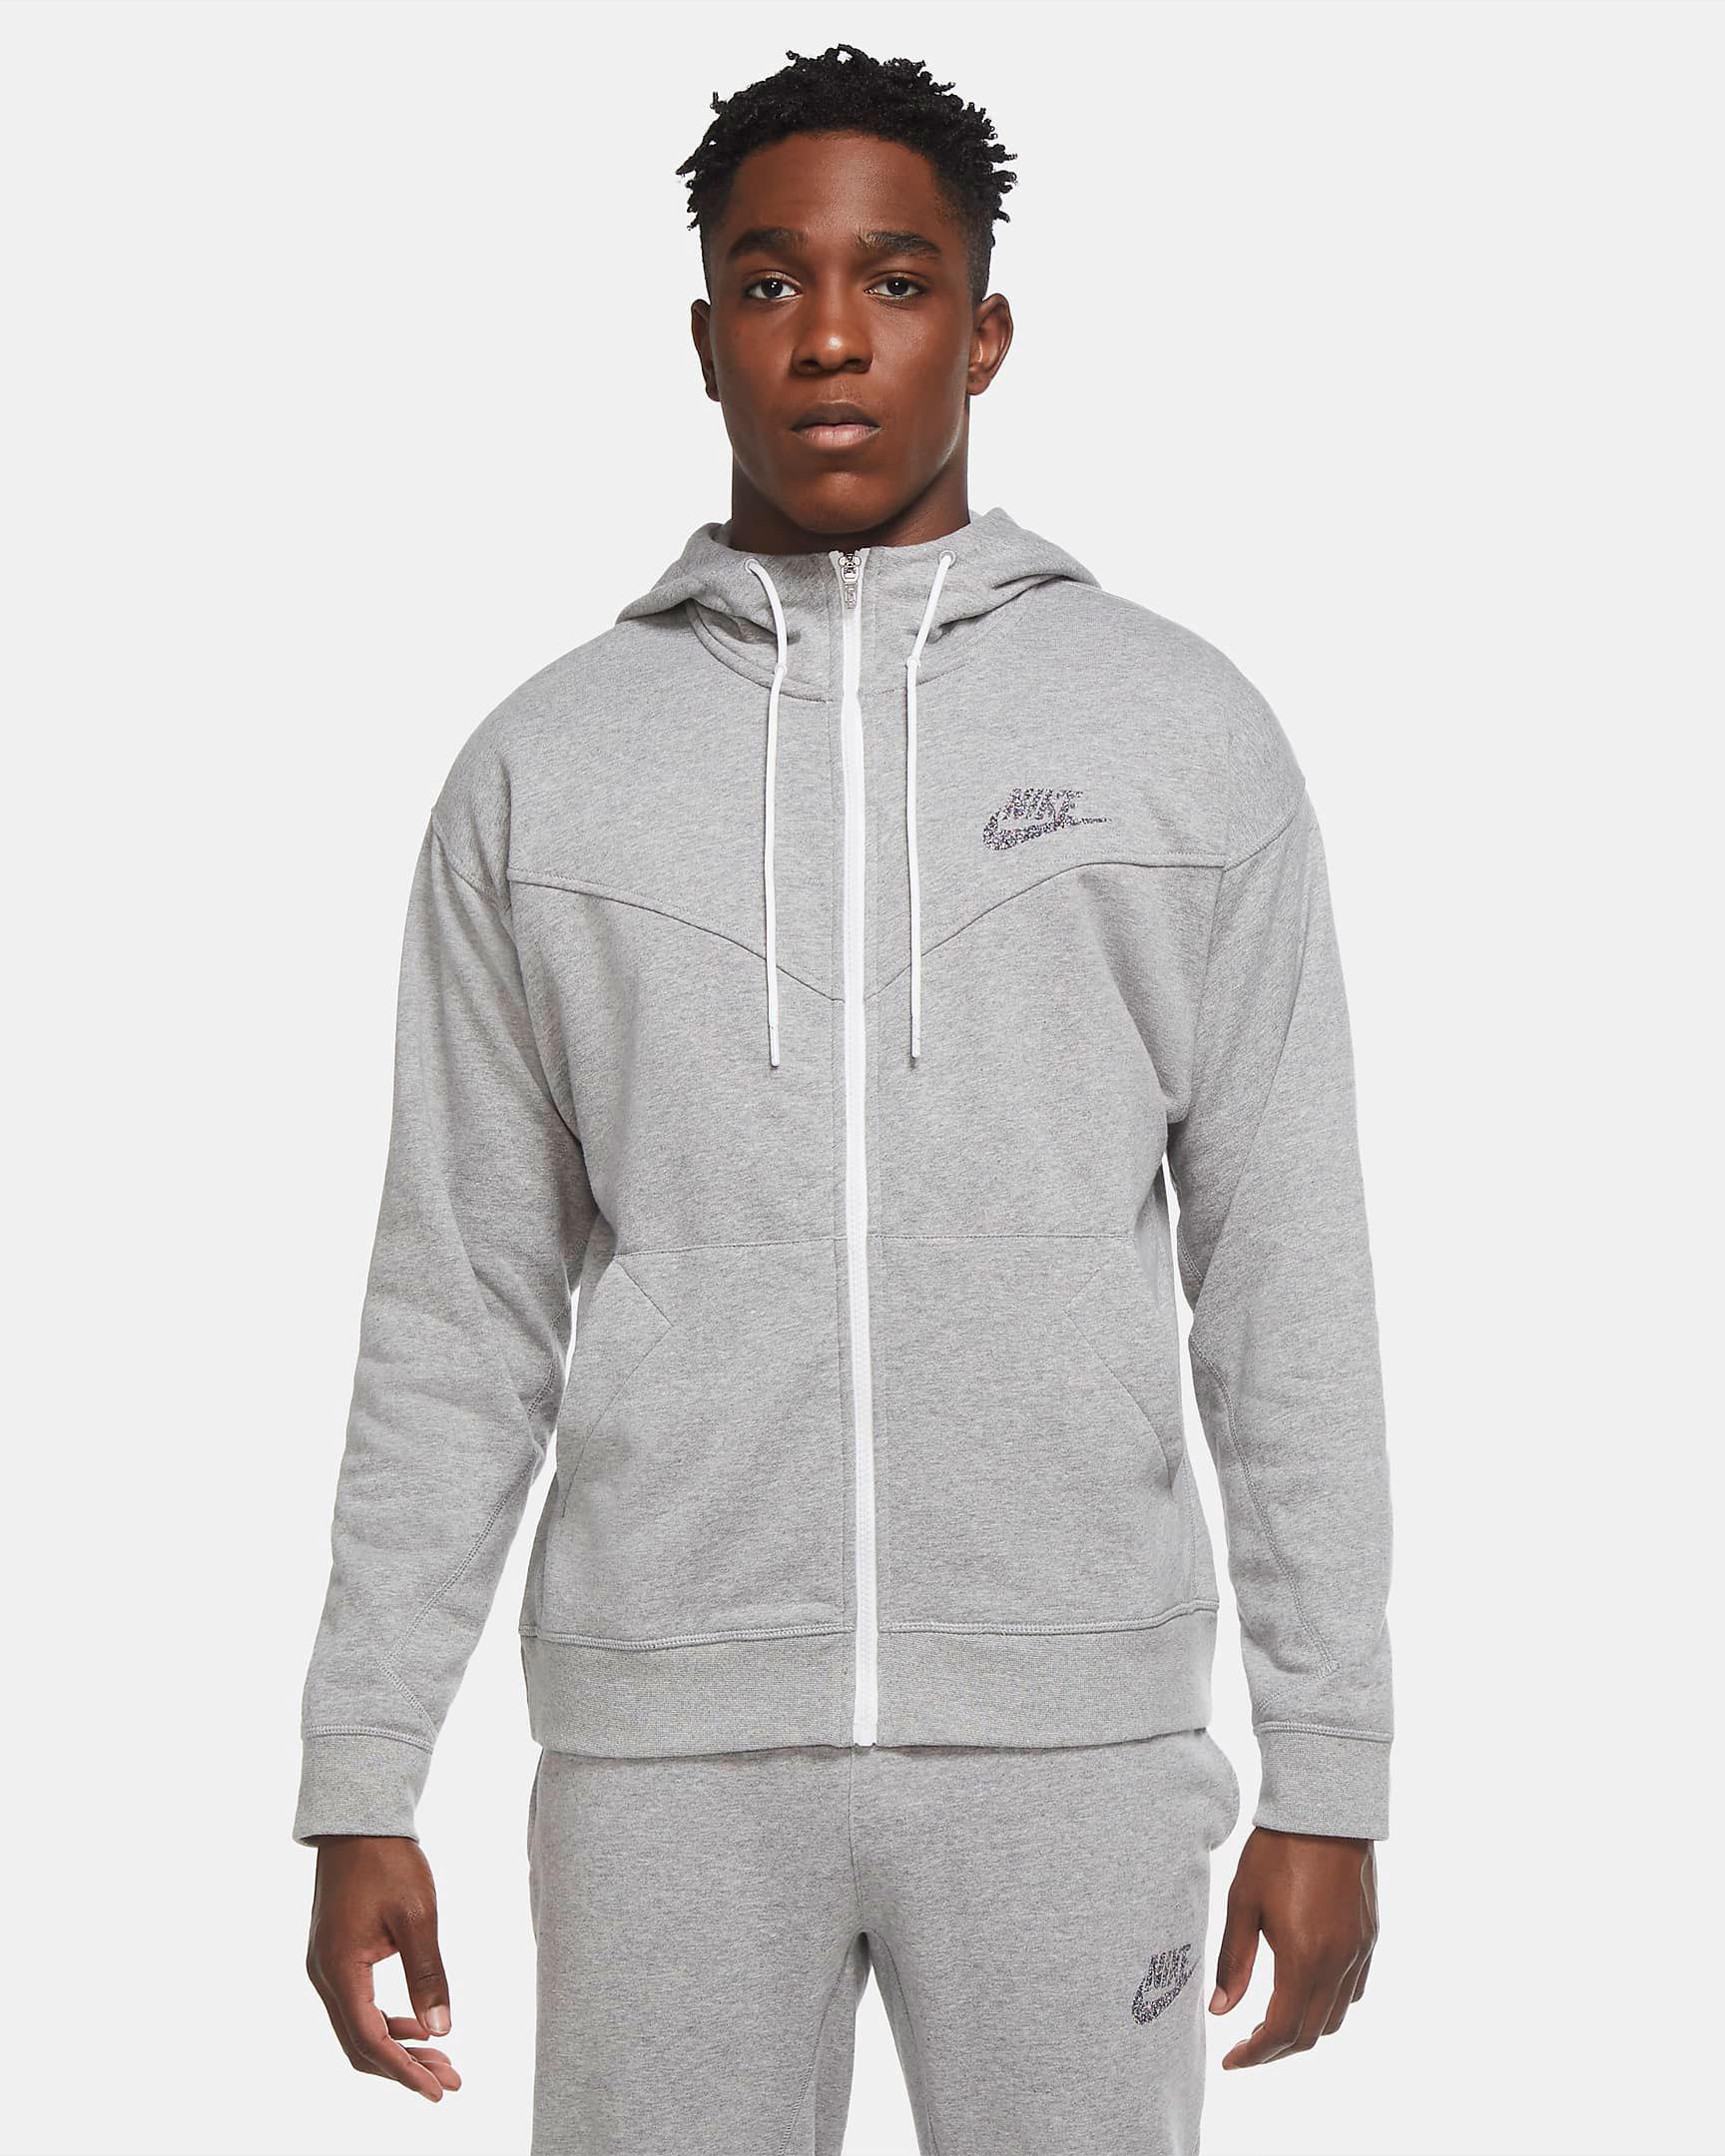 nike-adapt-bb-2-mag-grey-hoodie-to-match